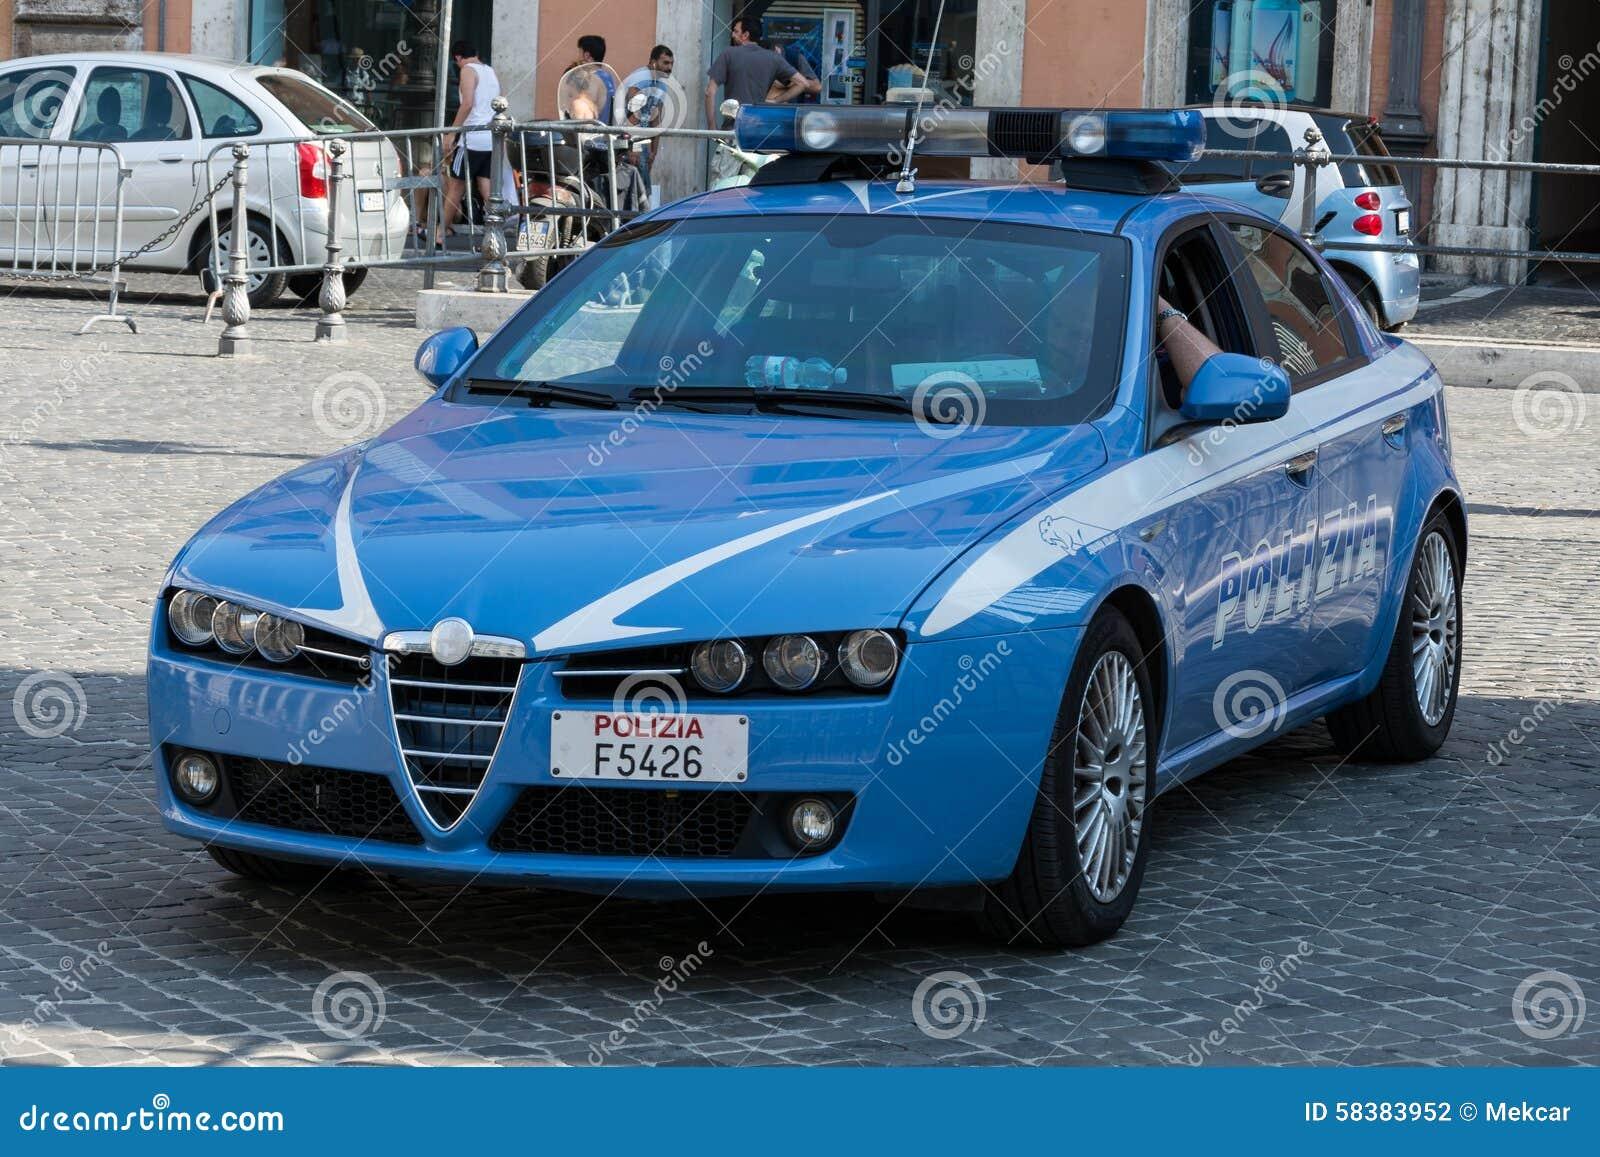 italian police car alfa romeo 159 editorial photography image 58383952. Black Bedroom Furniture Sets. Home Design Ideas